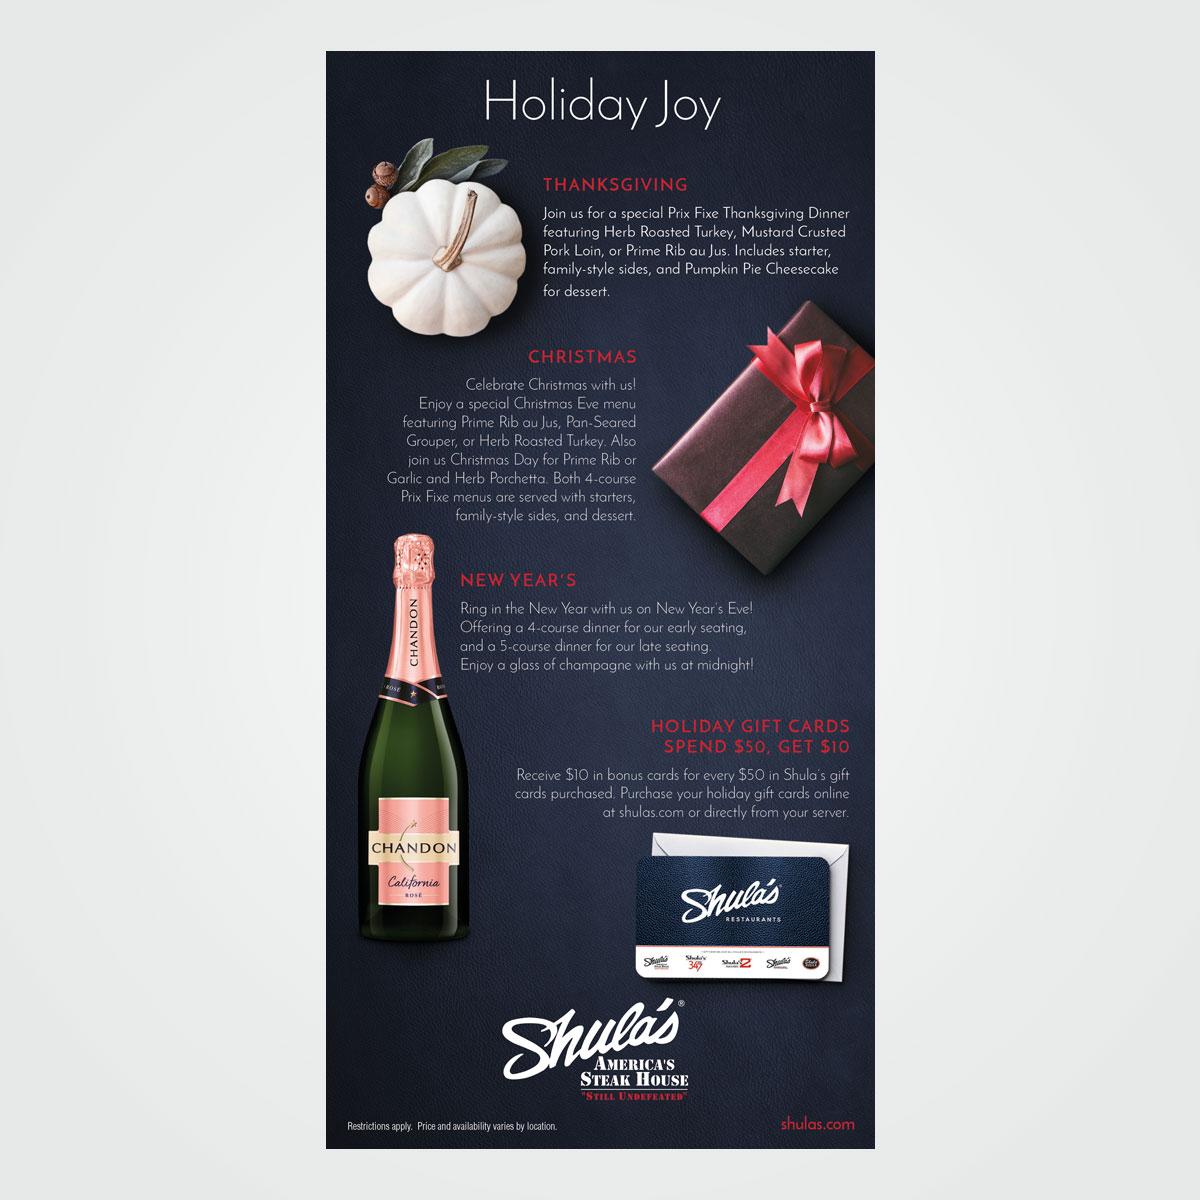 Holiday check presenter for Shula's Restaurants